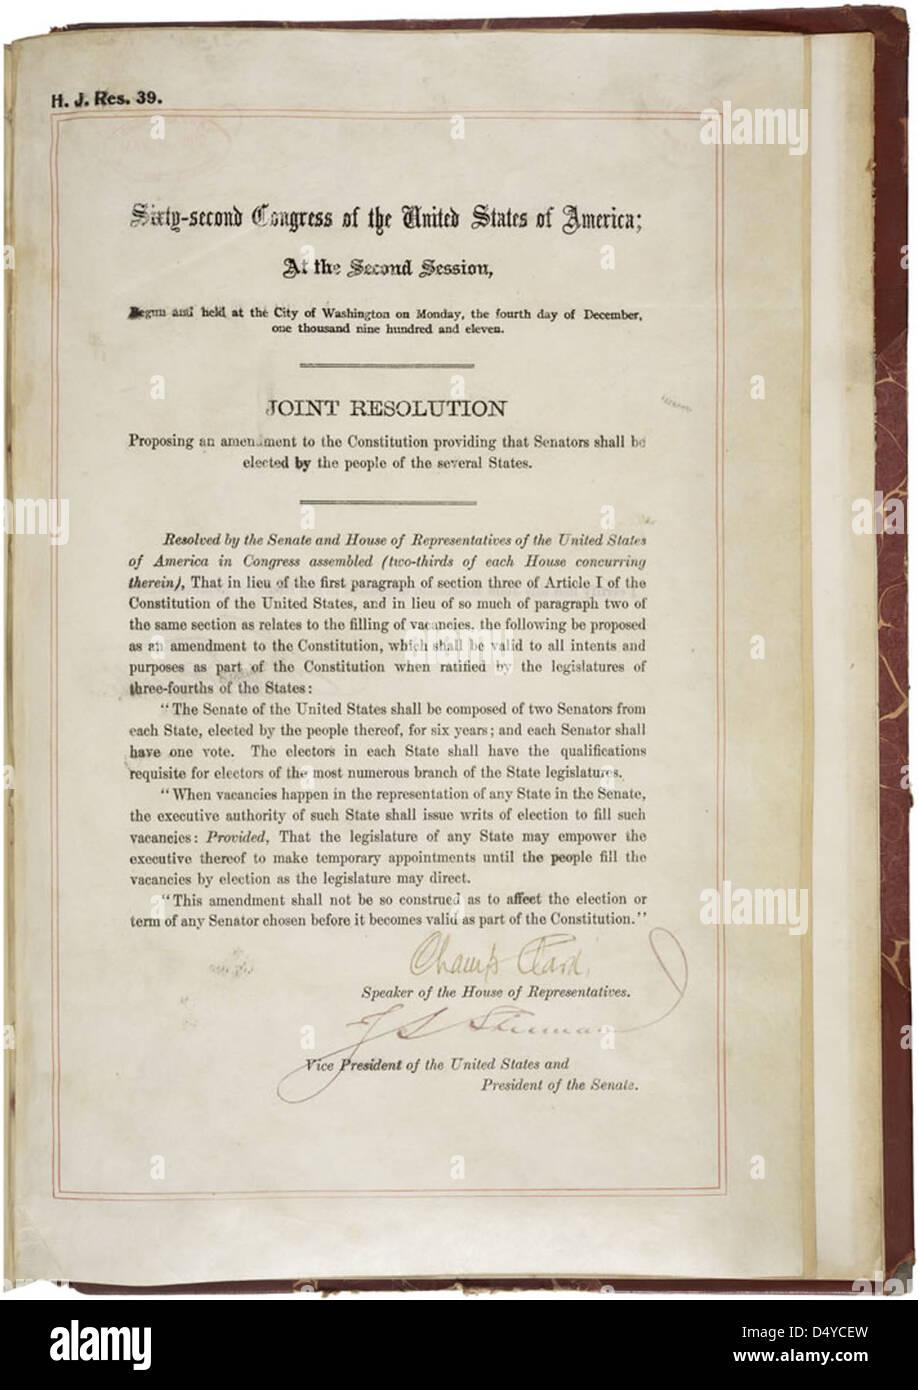 17th Amendment to the U.S. Constitution: Direct Election of U.S. Senators (1913) - Stock Image